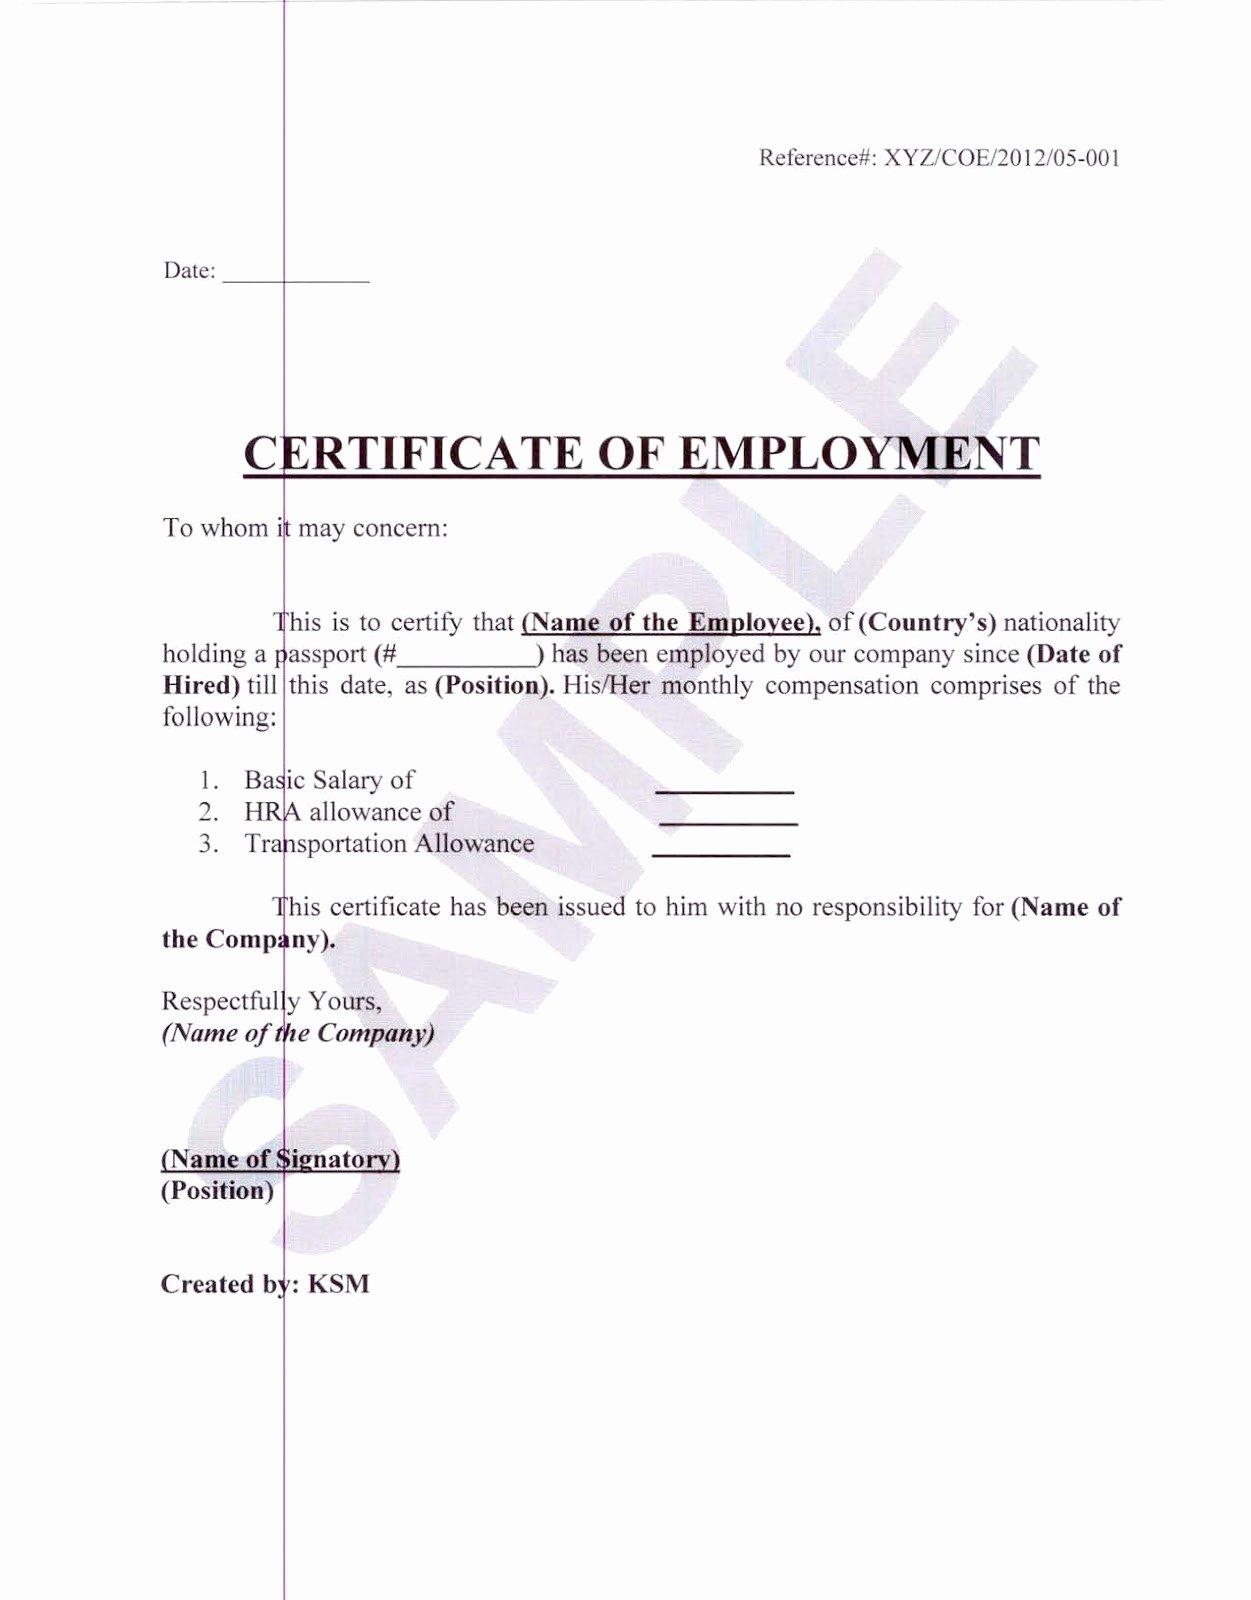 Certificate Of Employment Template Unique Employee Certificate Sample Certificate Employment